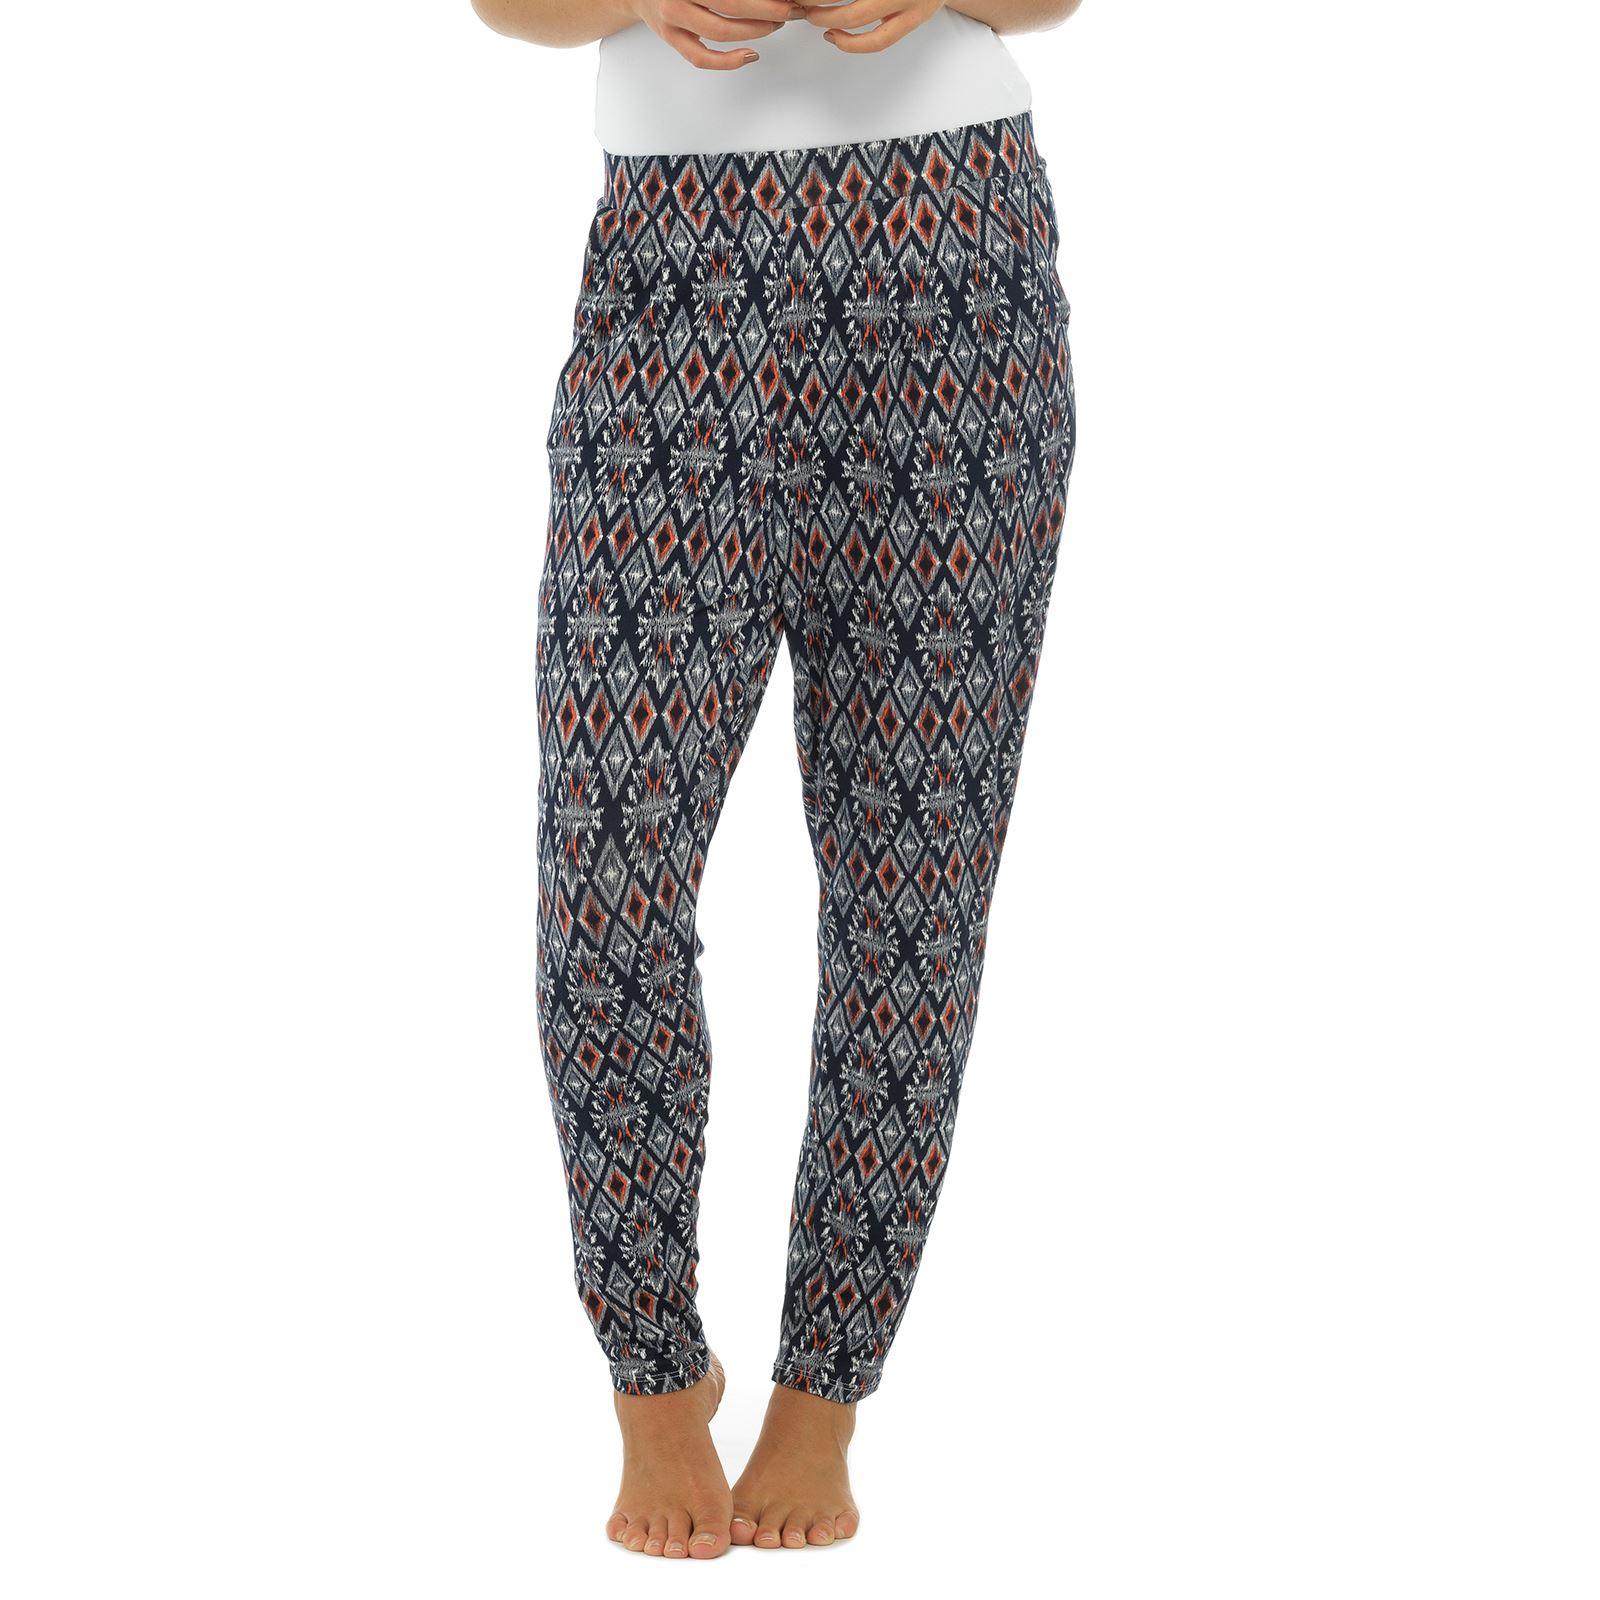 enjoy bottom price various styles hot sale Details about Ladies Full Length Jersey Harem Pants Boho Ali Baba Baggy  Leggings Trousers